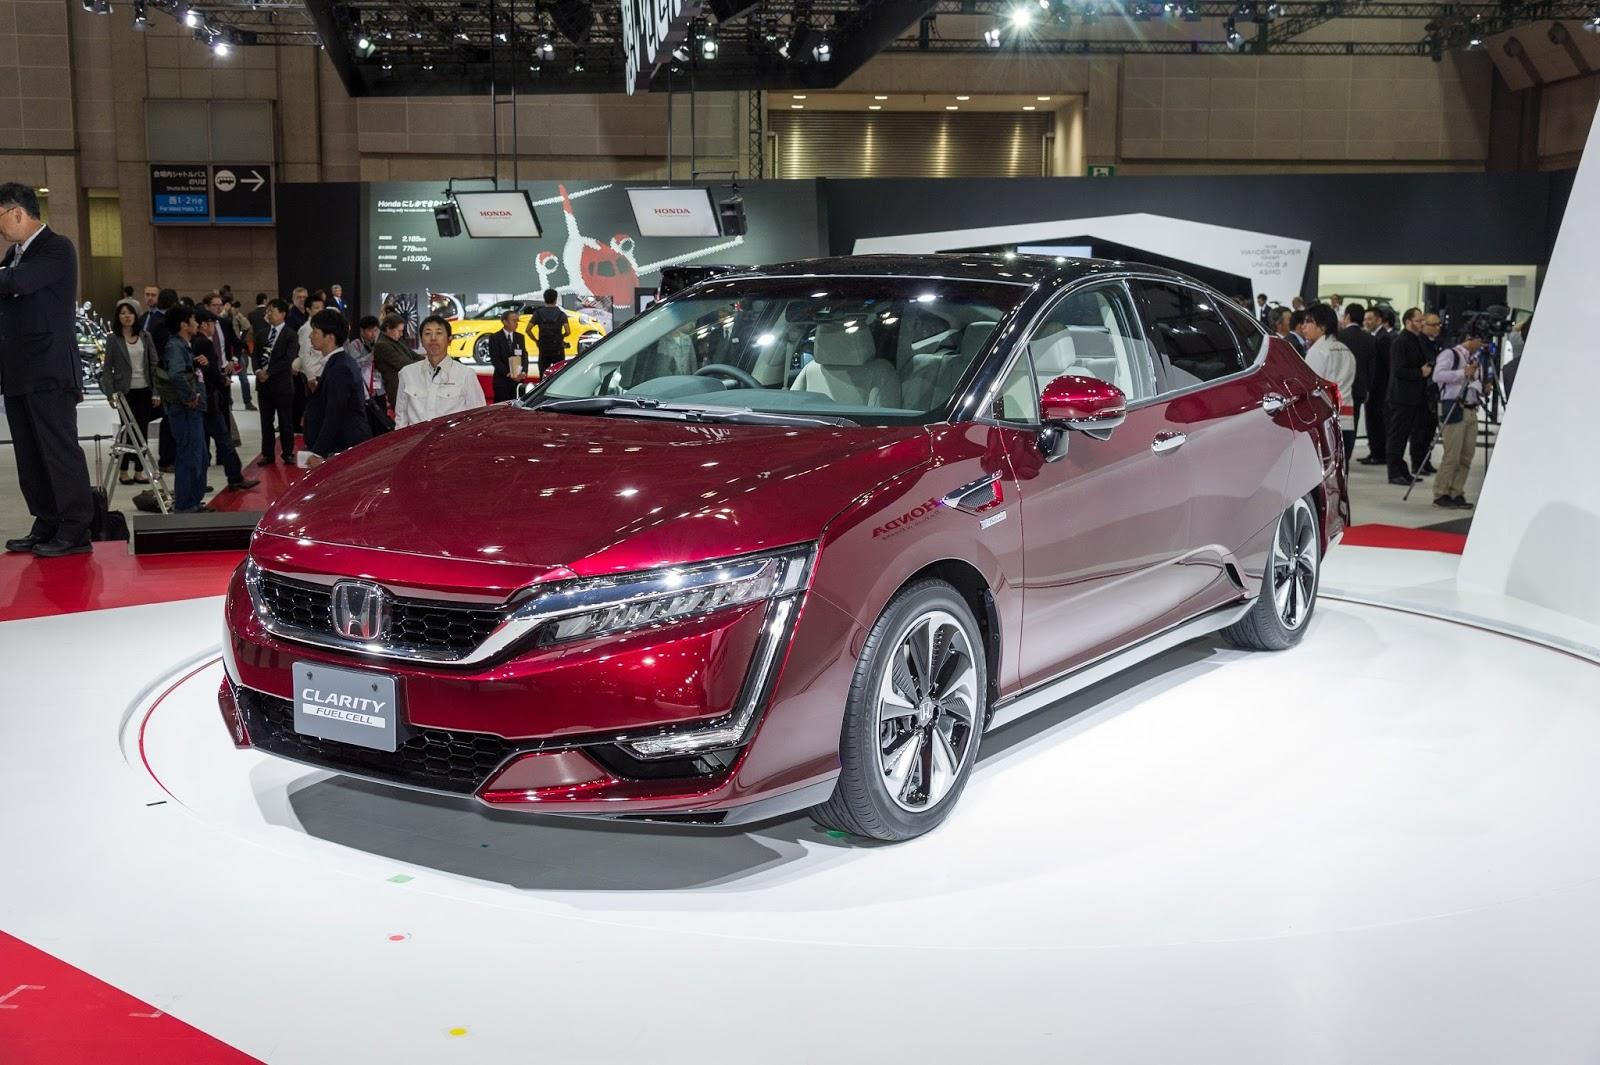 Honda%2BClarity%2BFuel%2Bcell%25281%2529 H Honda φέρνει στην Ευρώπη την απάντησή της στο Mirai Honda, Honda Clarity Fuel Cell, κυψέλες καυσίμου, υδρογόνο